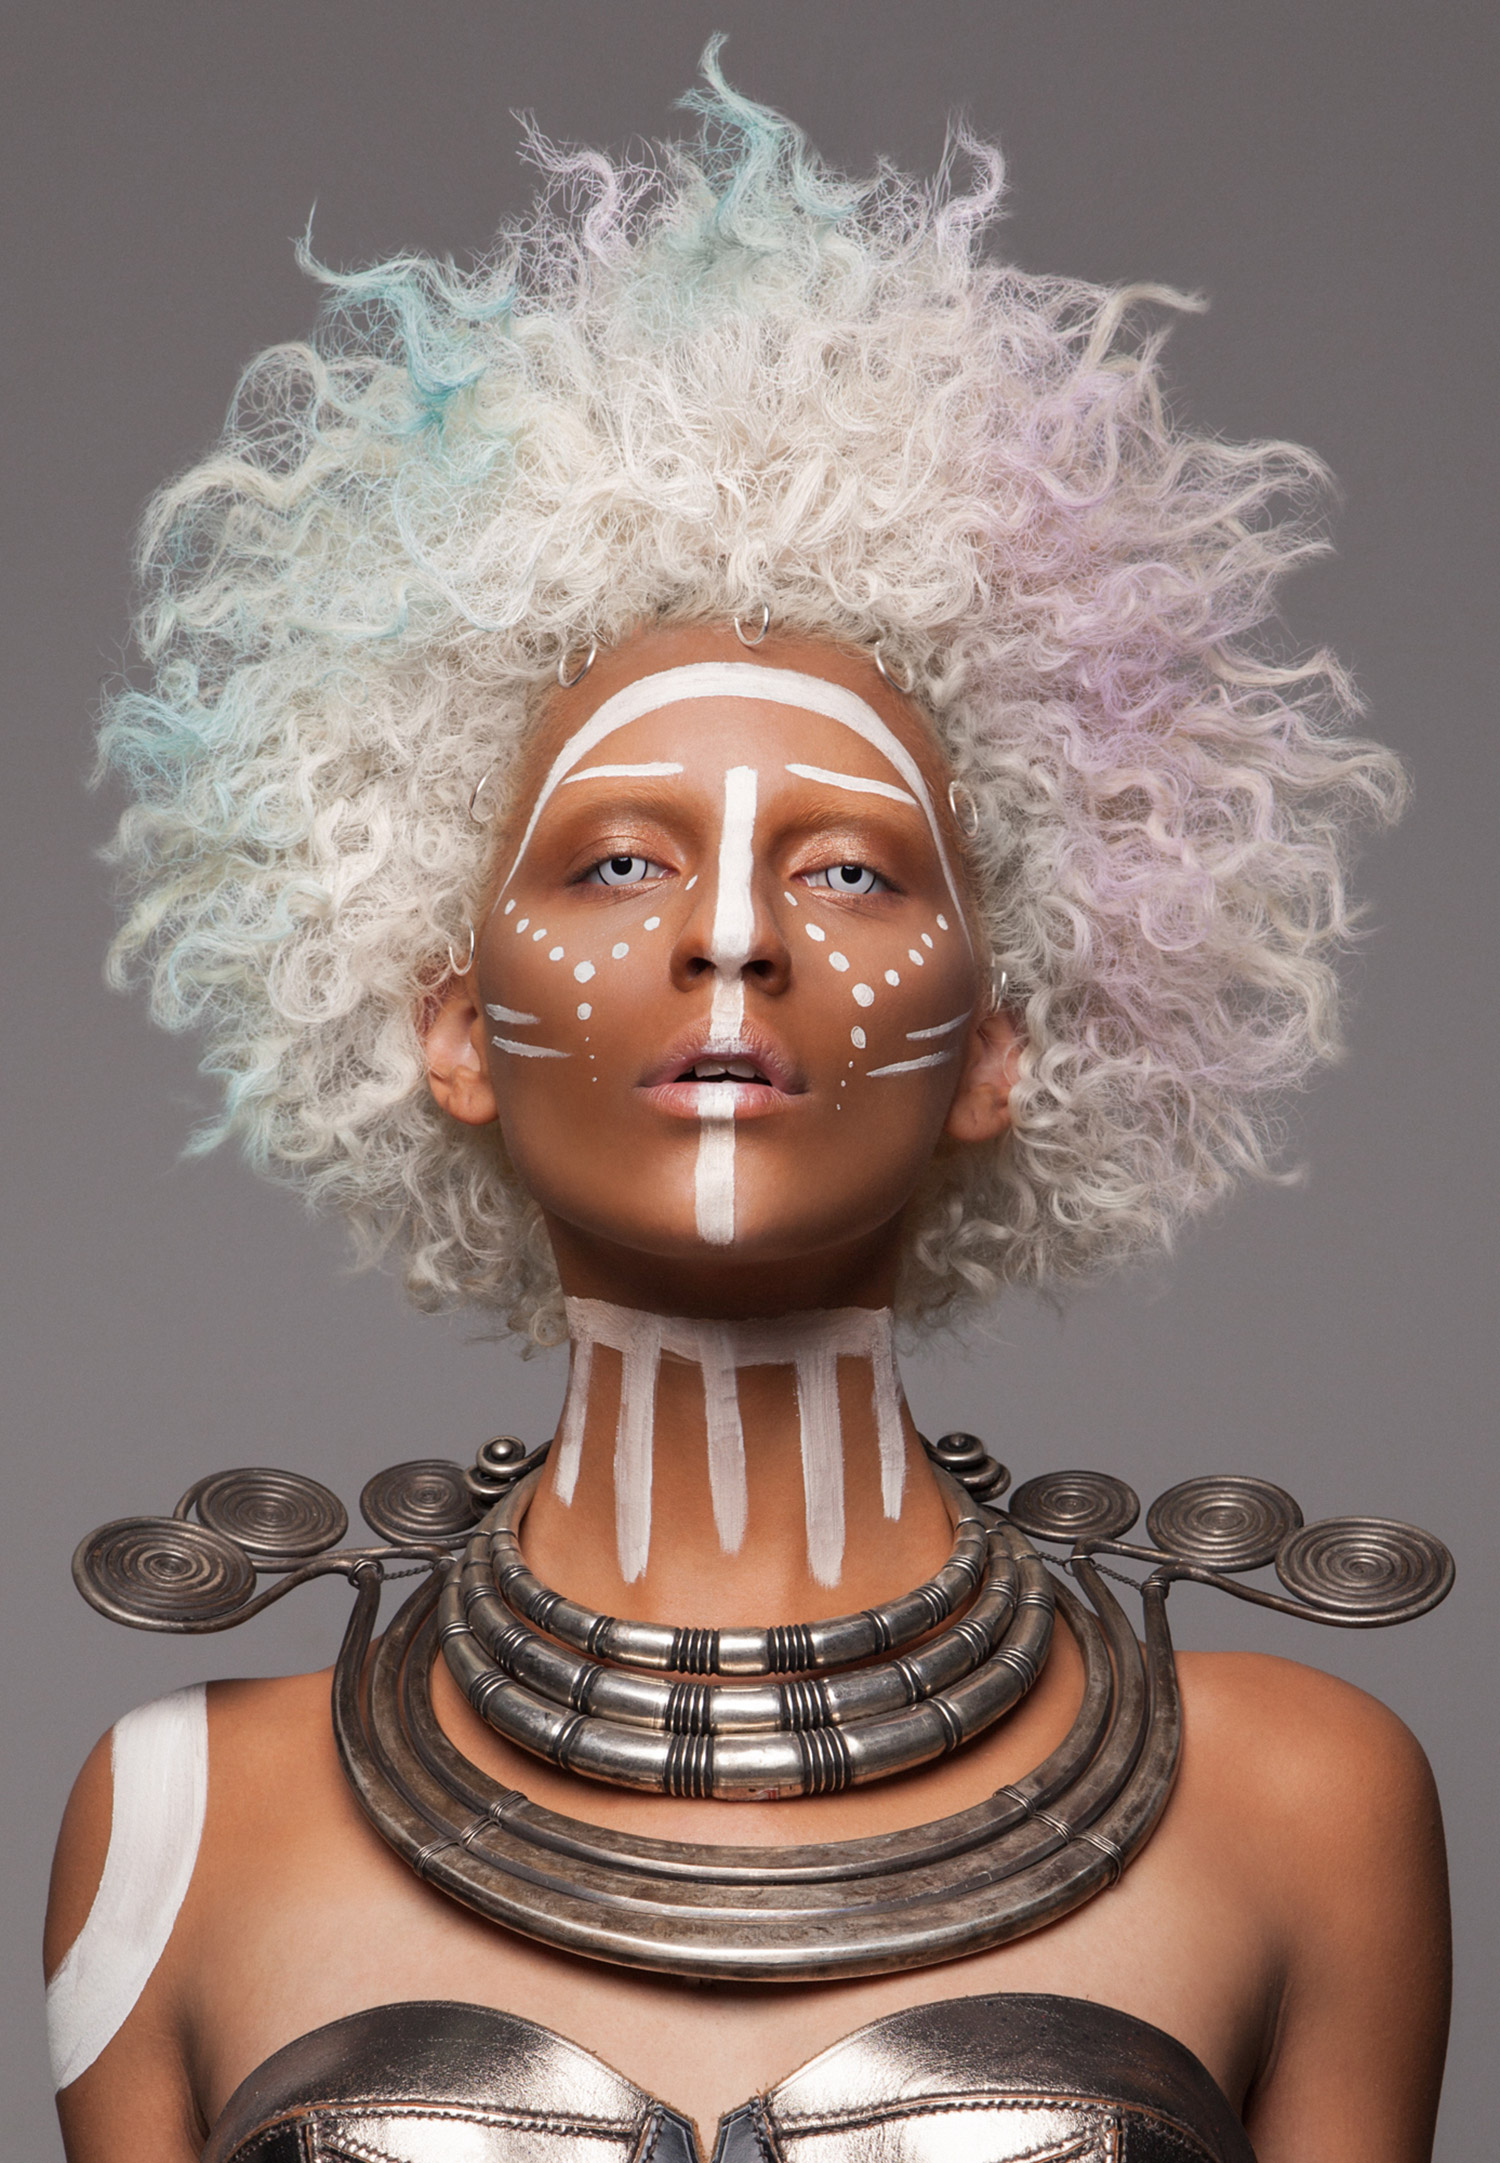 Luke Nugent - British Hair Awards 2016 - Afro Finalist Collection - blonde afro